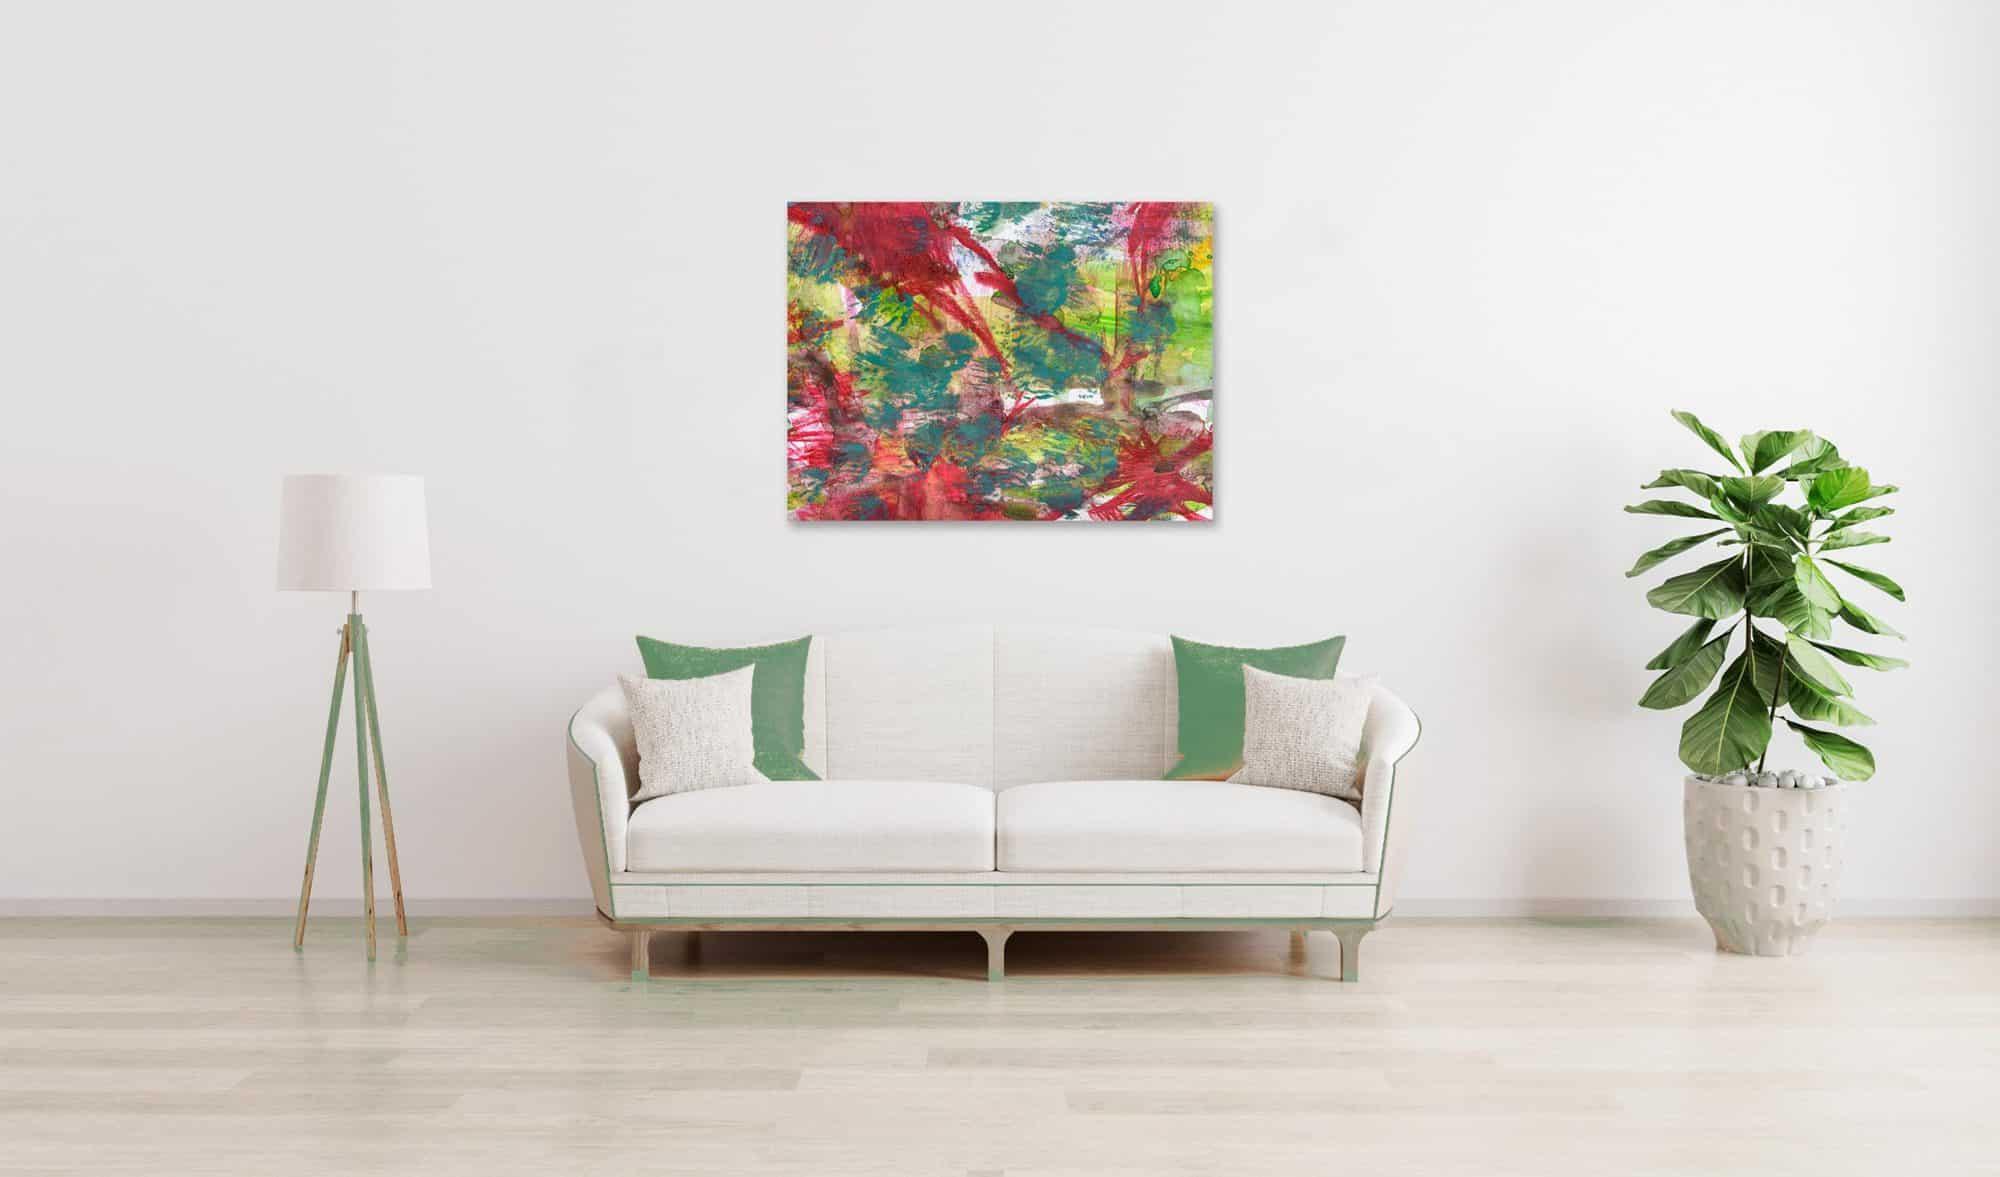 Abstraktes Acrylbild Gruen Rote Abstraktion wandbild